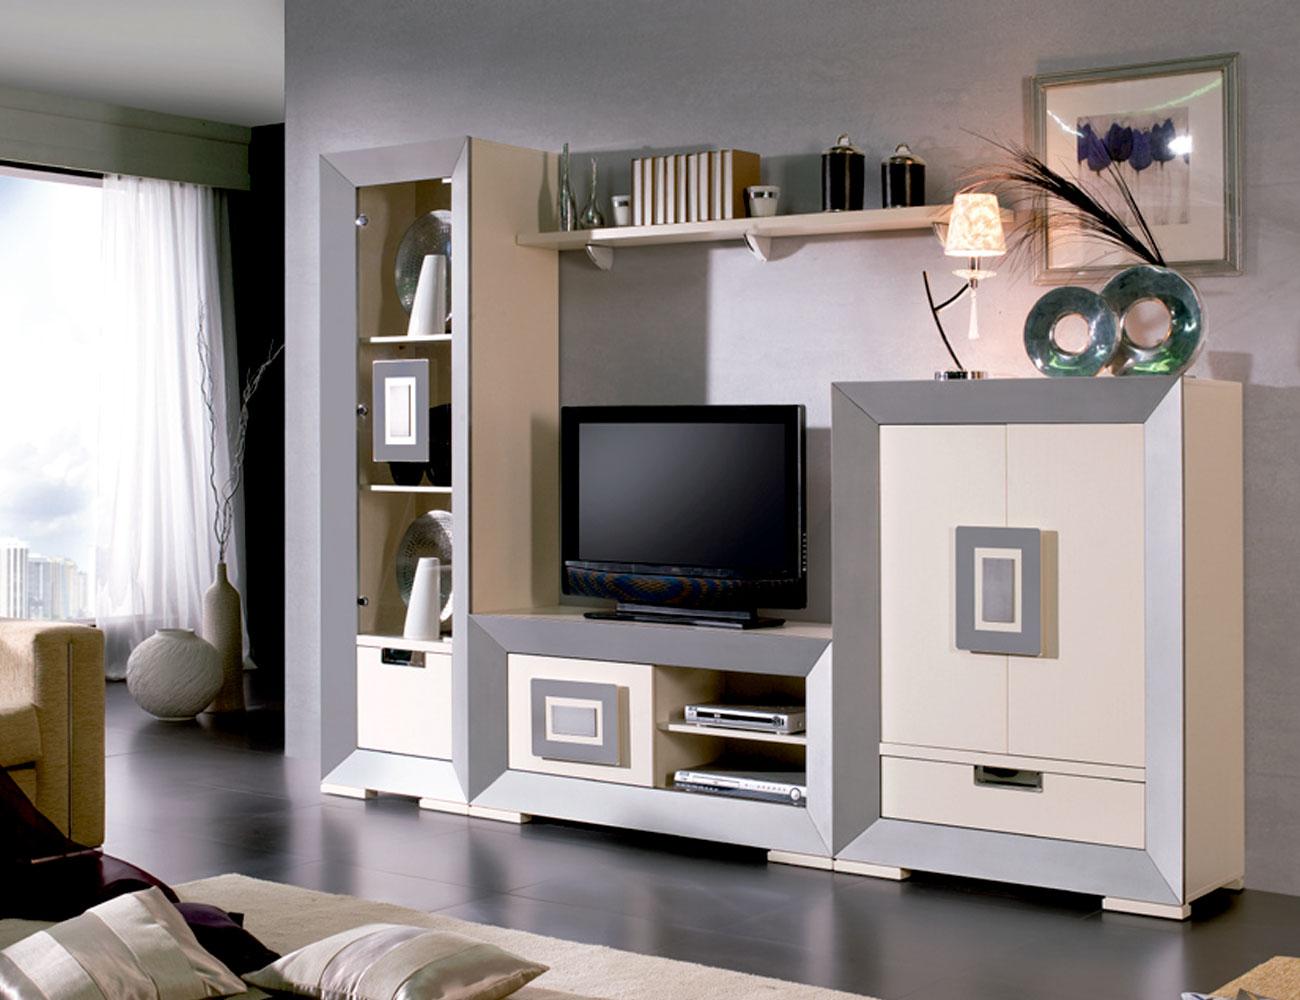 Mueble salon neoclasico color 504 503 tirador acero3